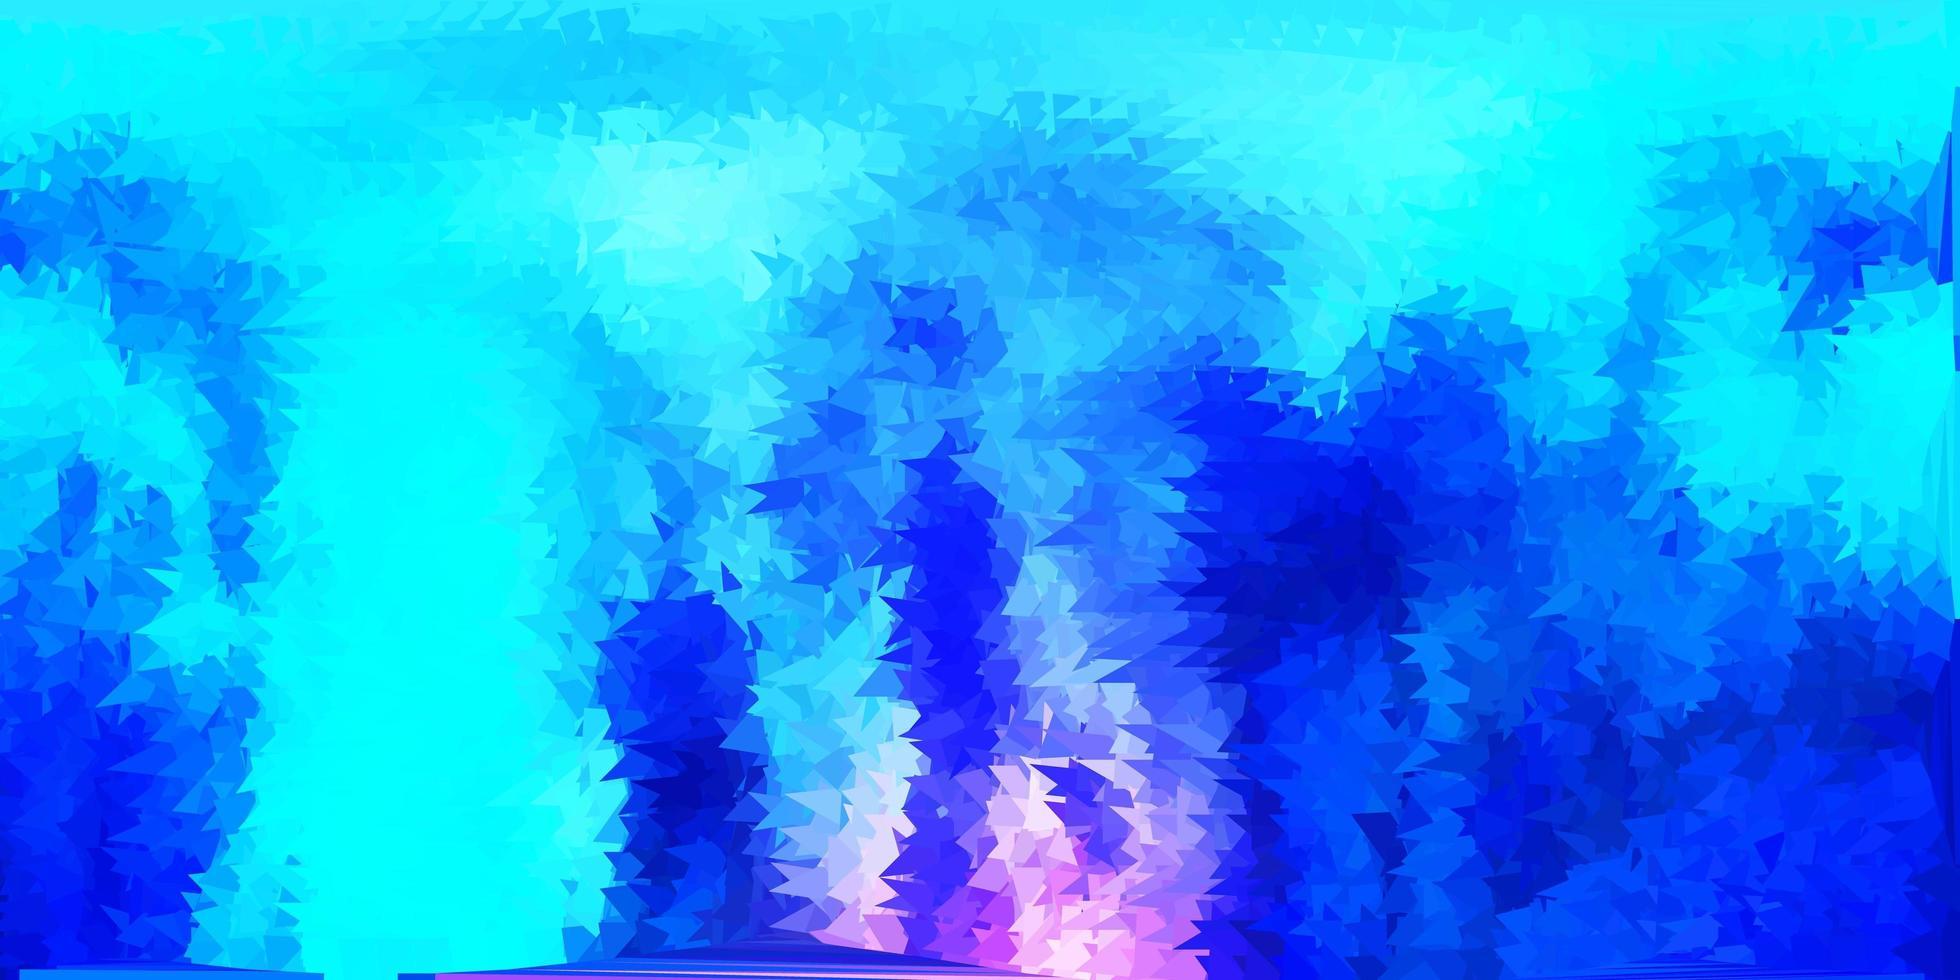 dunkelrosa, blaues Vektordreieck-Mosaikmuster. vektor